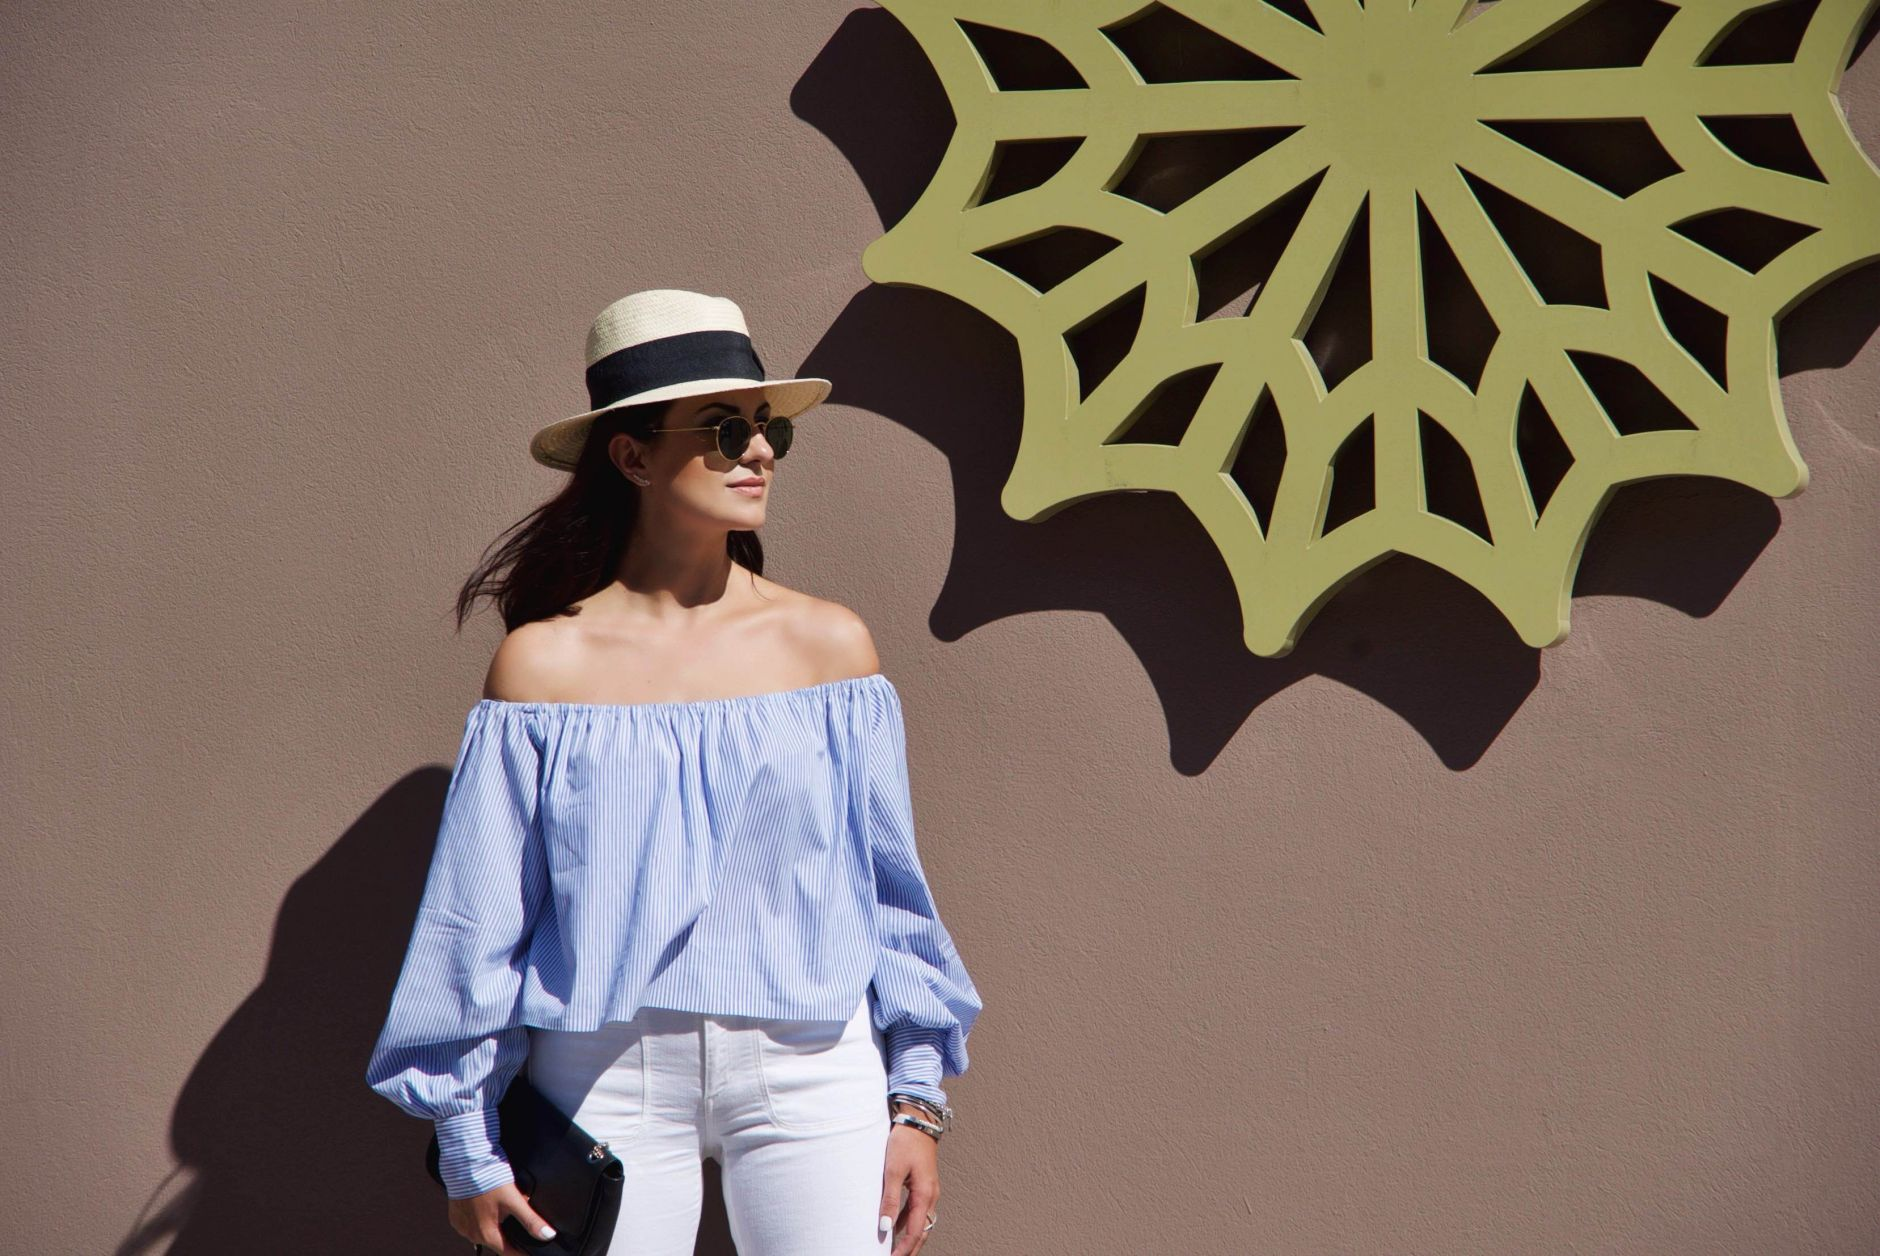 01-Tiara-Miramar-Beach-Hotel-Spa-Cote-dAzur-Yllka-Brada-Collaboration-Disi-Couture